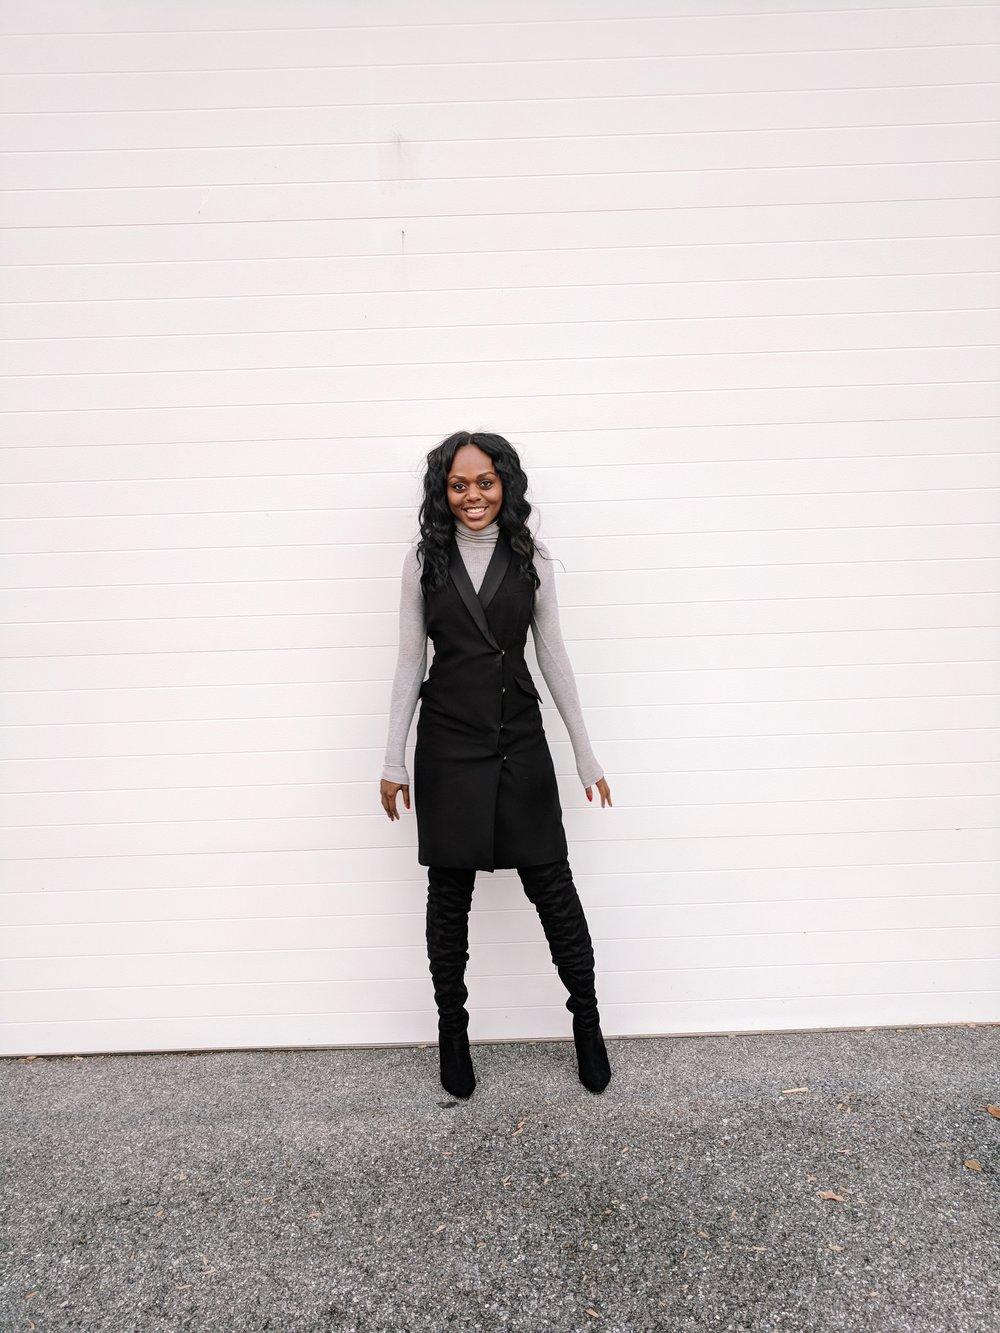 Self-love is revolutionary and evolutionary. - -Jasmine, #MHOF